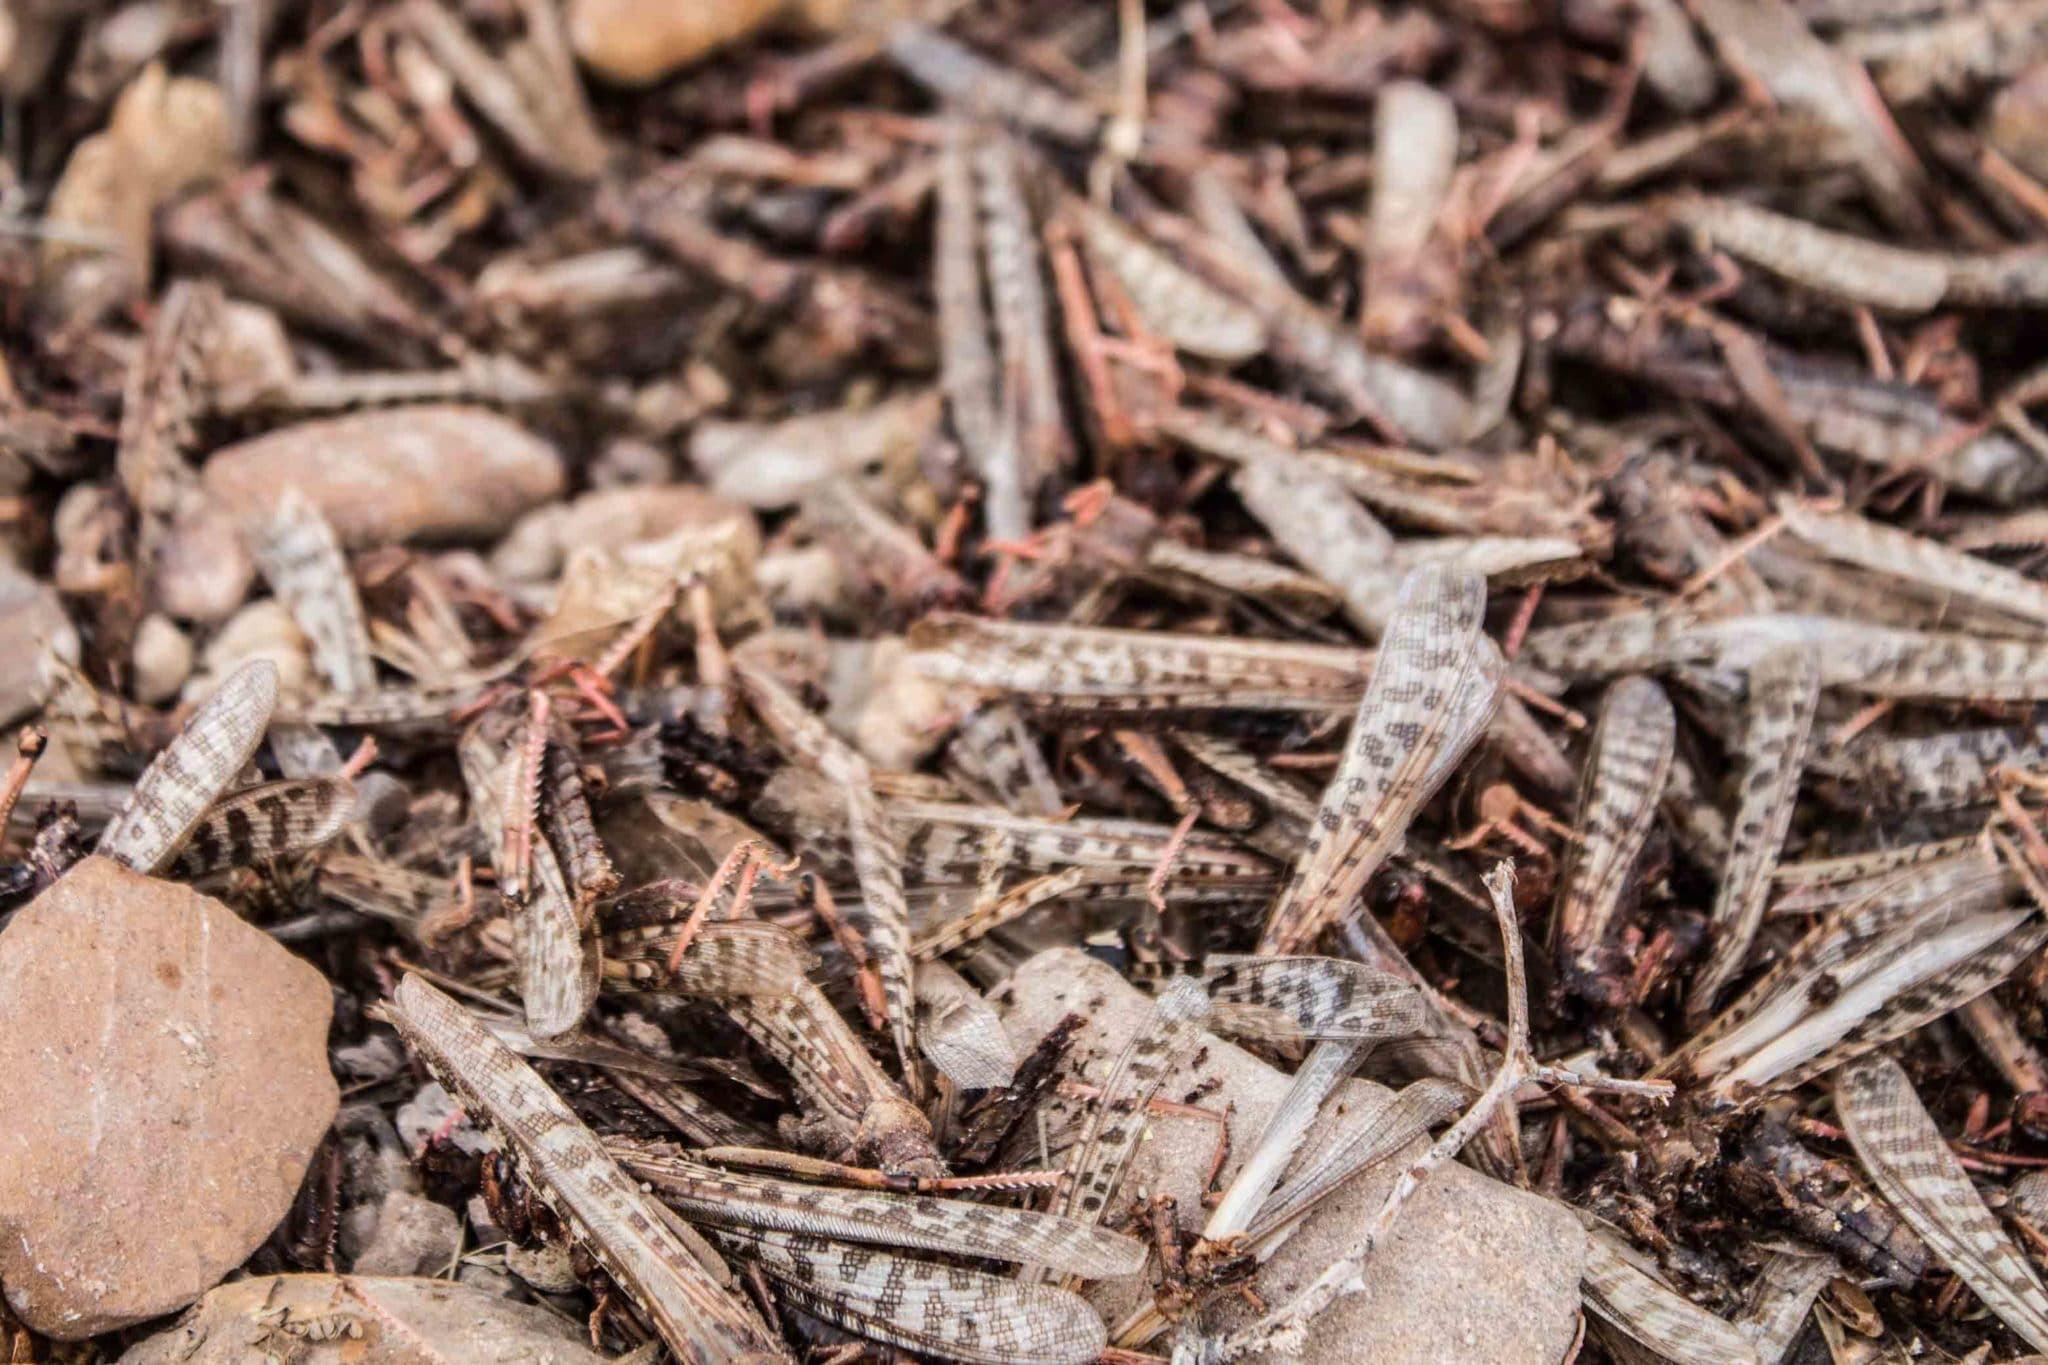 Pesticide-killed locusts